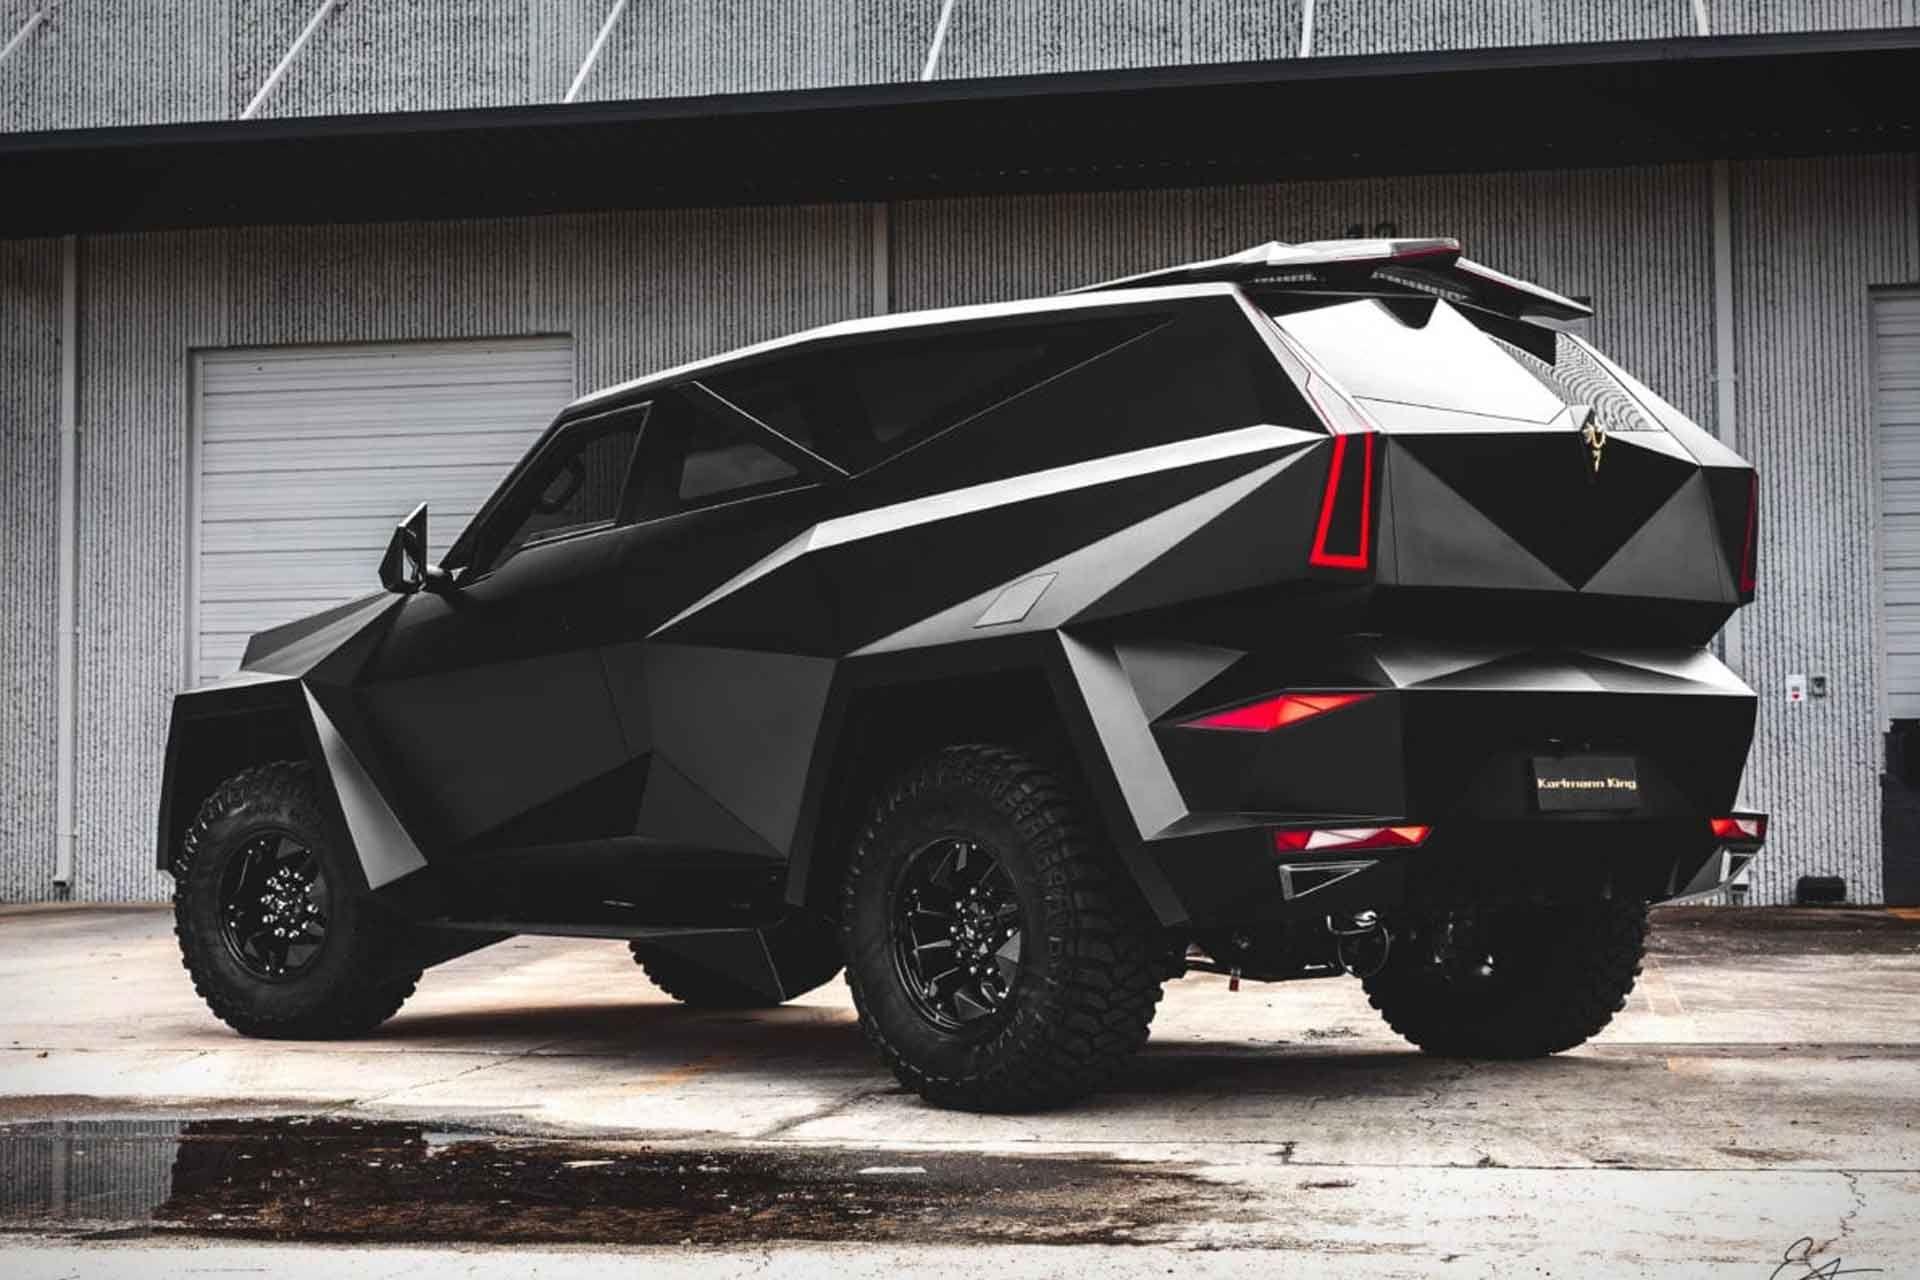 Karlmann King SUV Автомобиль будущего, Автомобиль